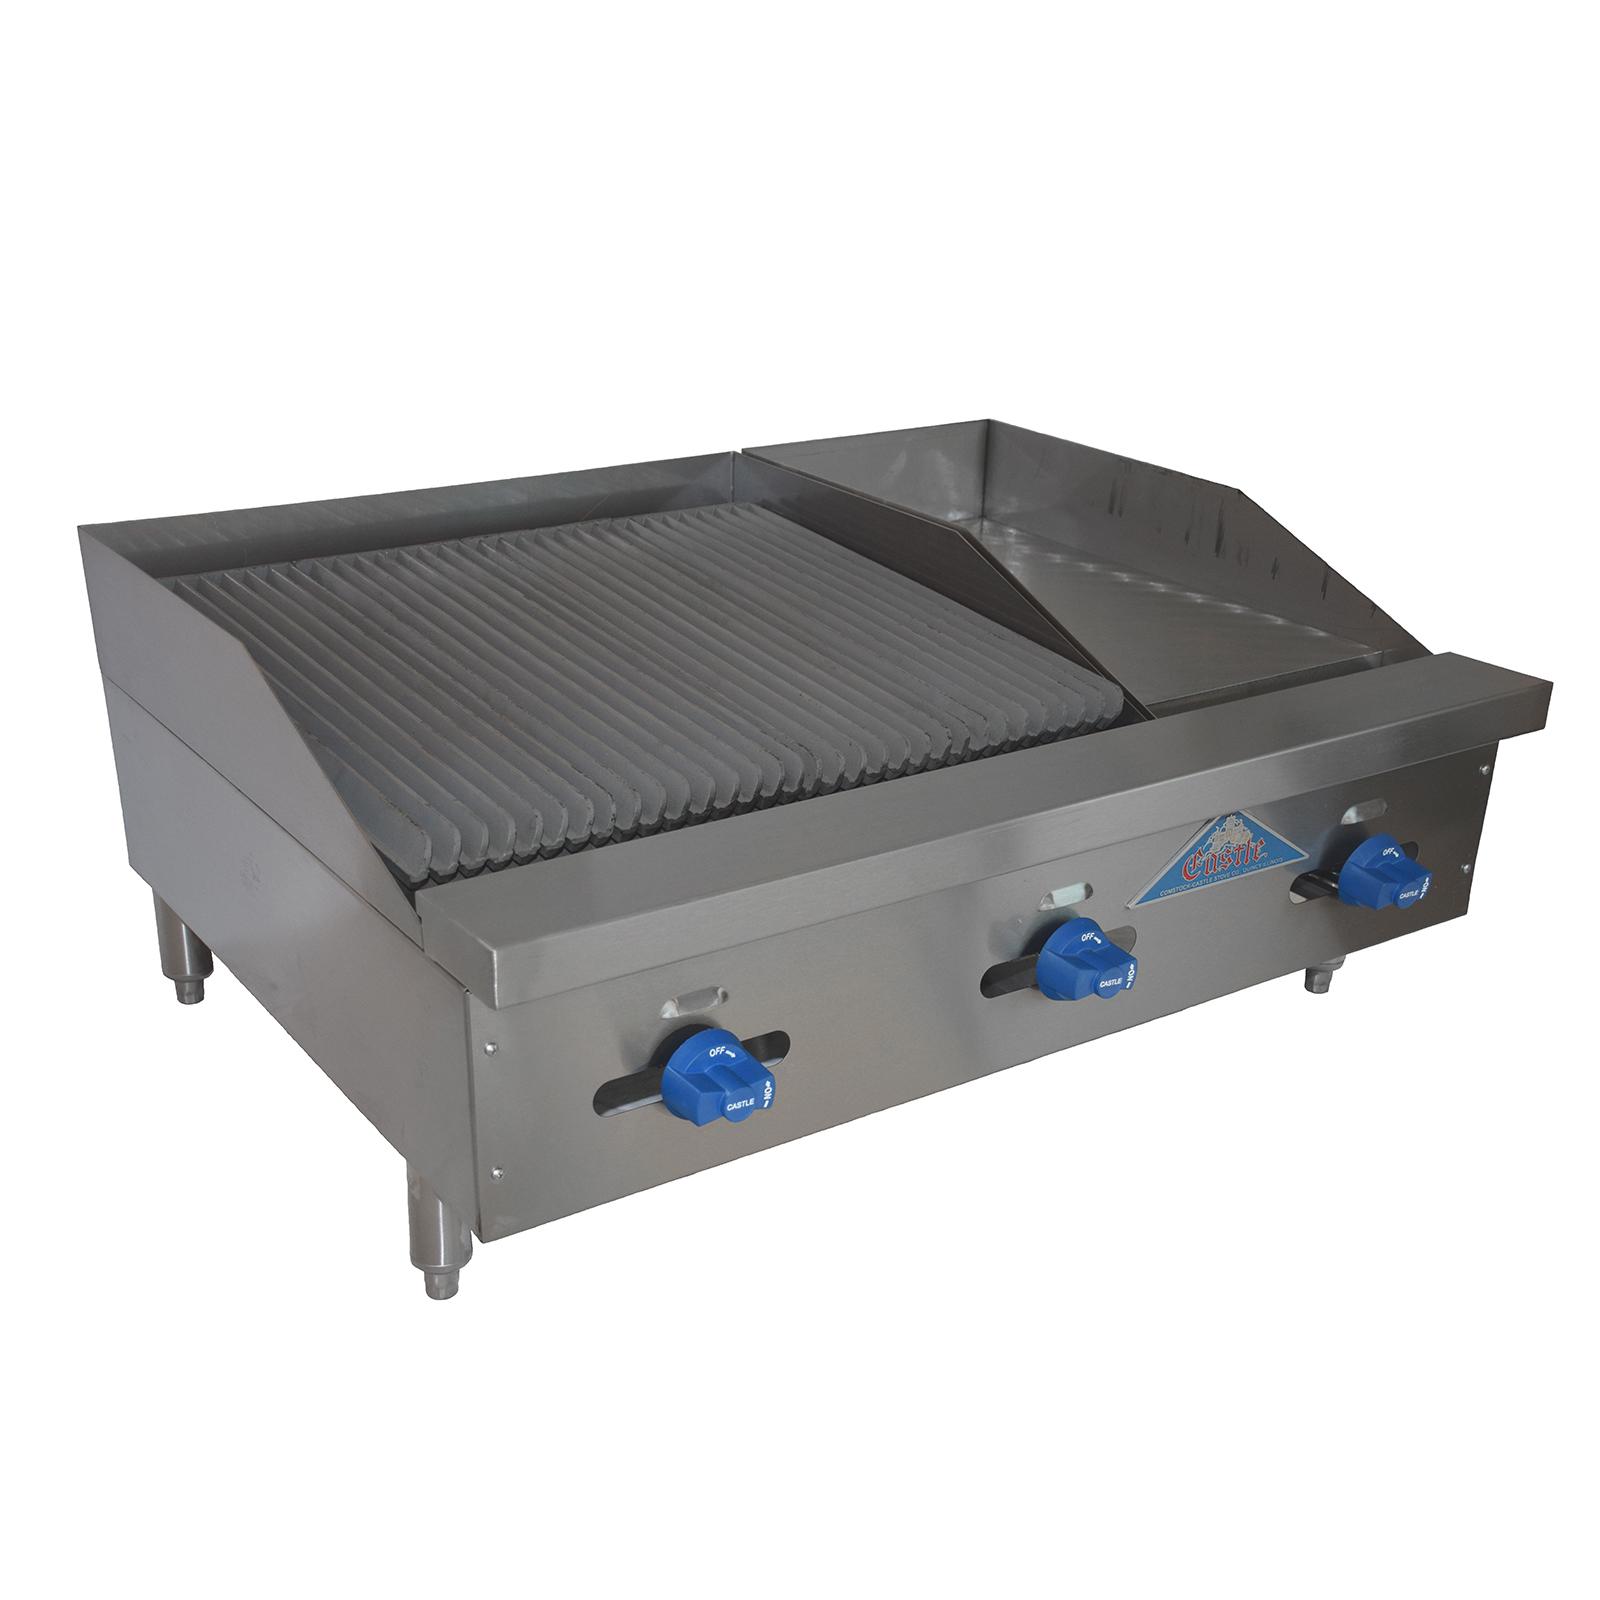 Comstock-Castle FHP36-12-2LB griddle / charbroiler, gas, countertop